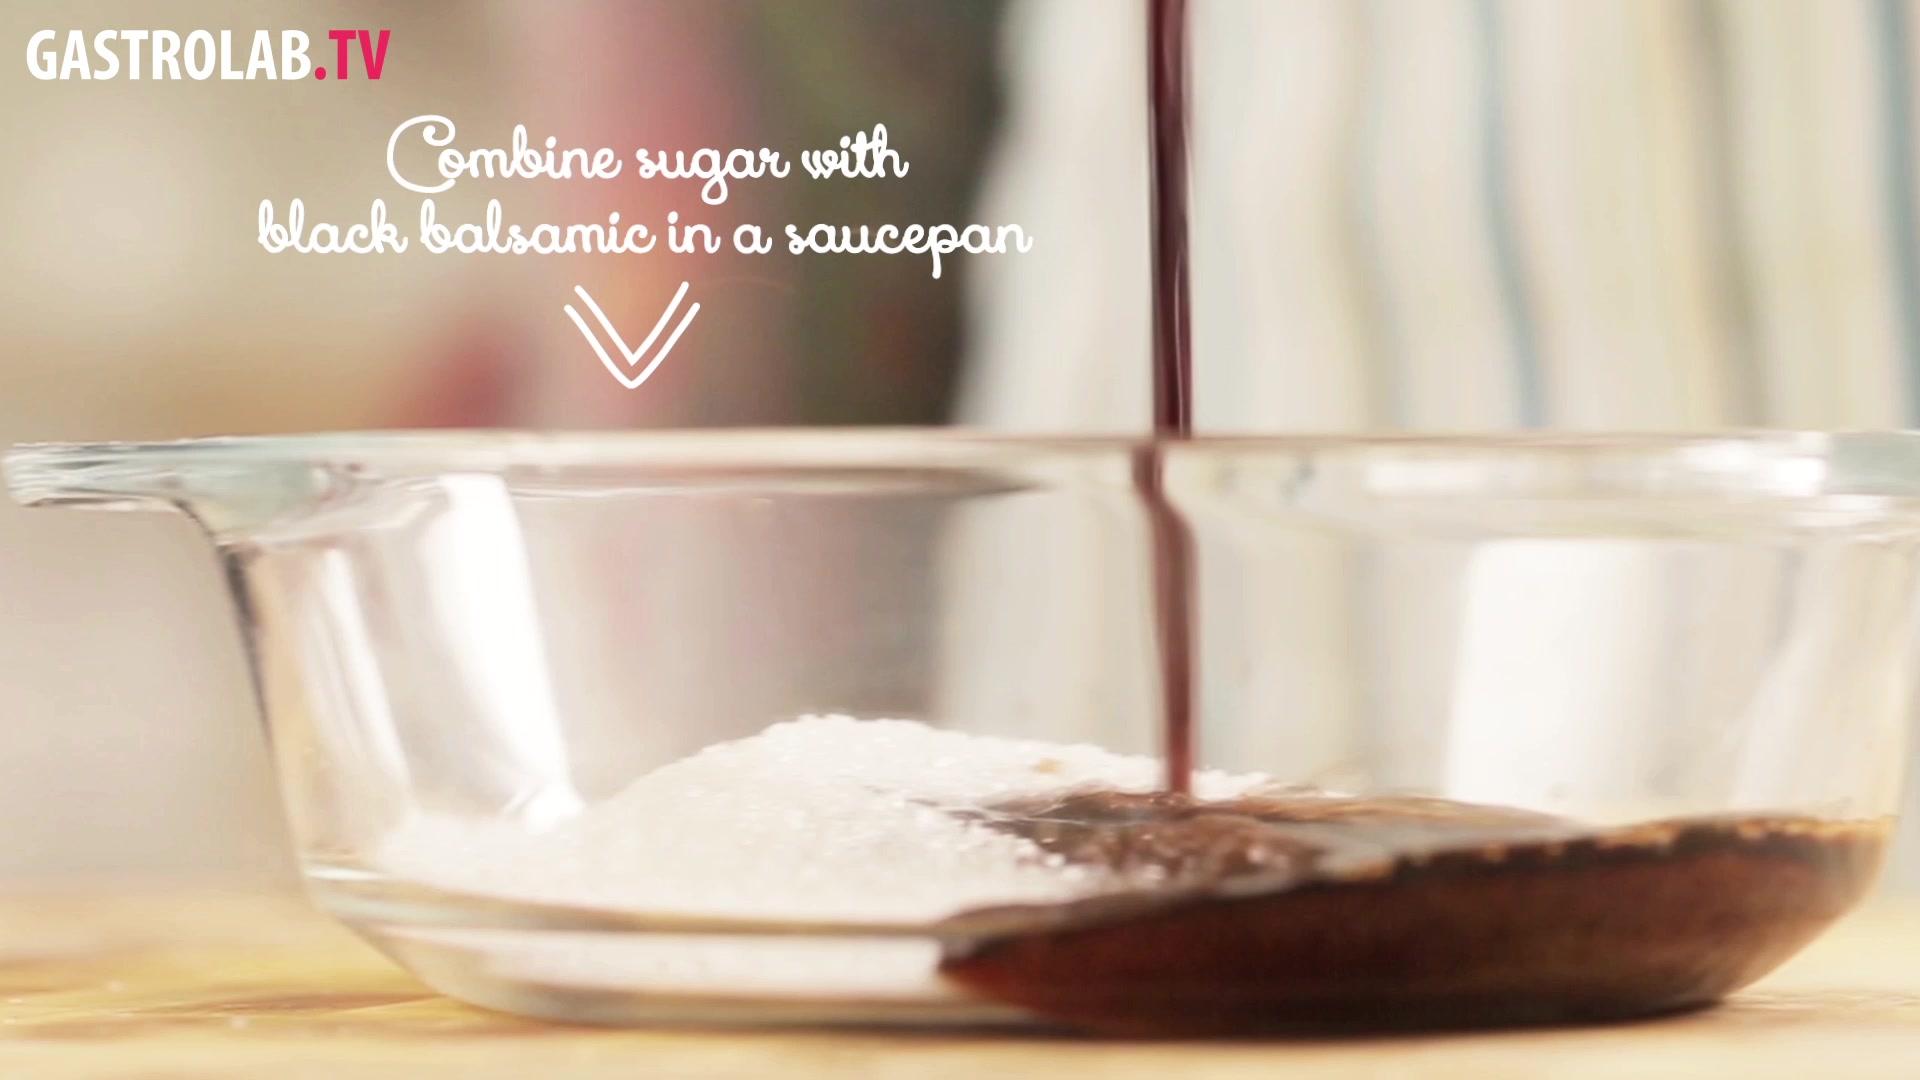 Raspberries and Black Balsamic Vinegar Syrup Recipe